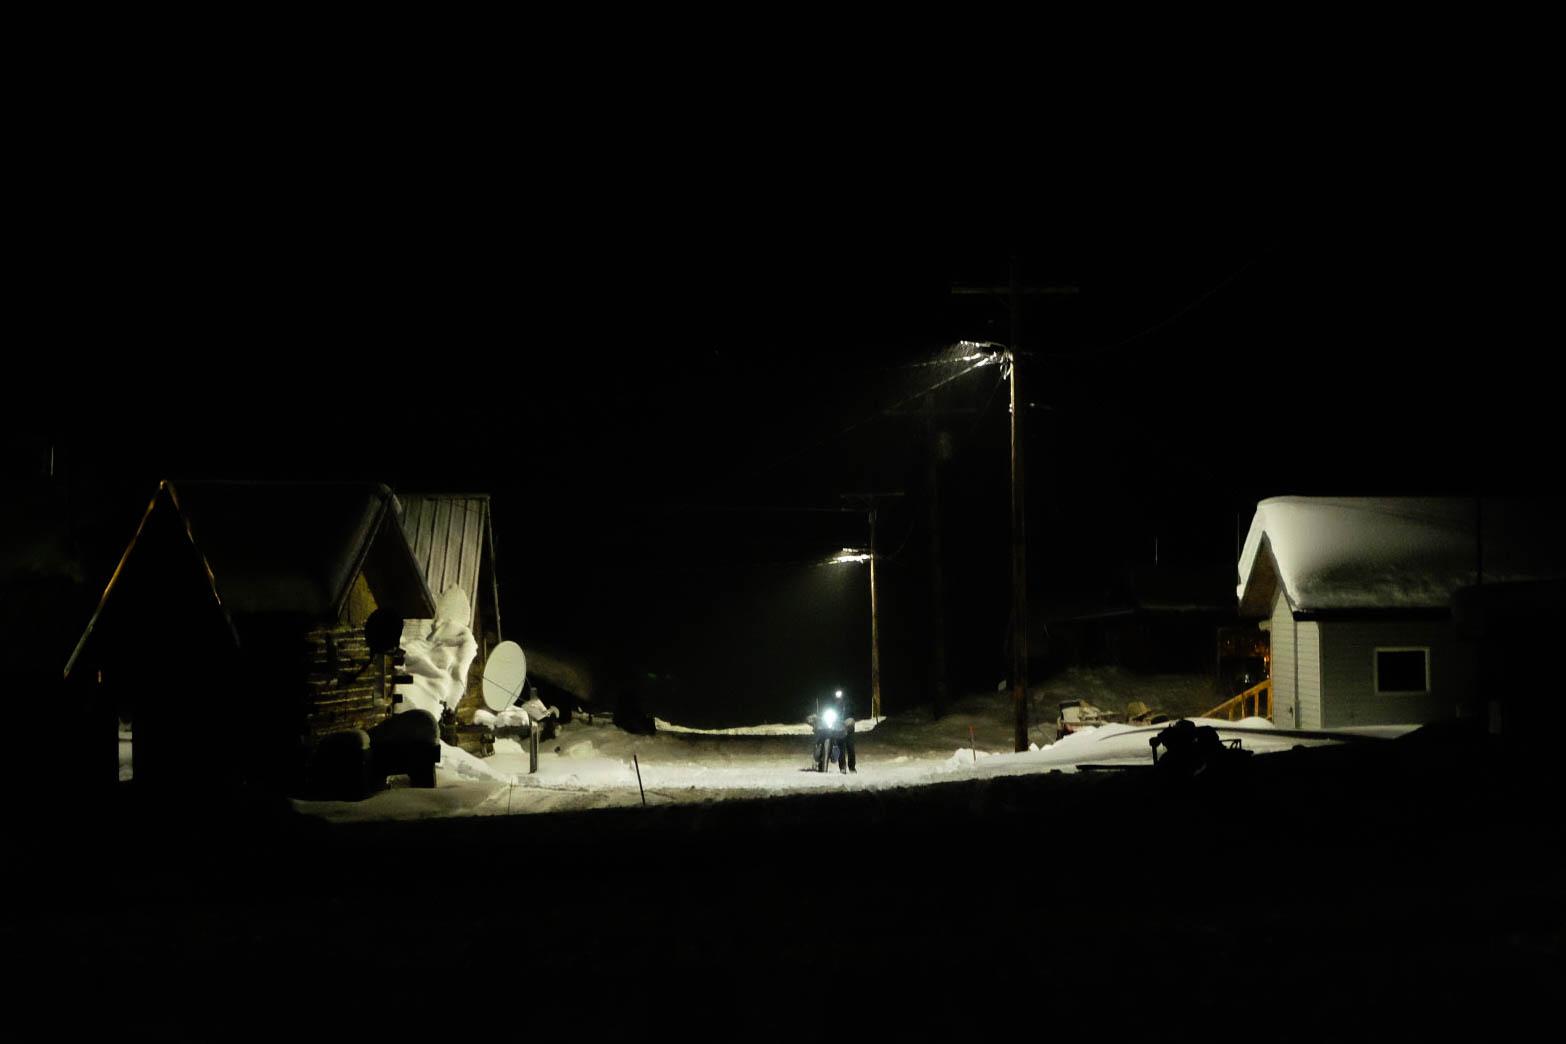 Steve Cannon arrives in Kaltag at 1am  📷 Nicholas Carmen